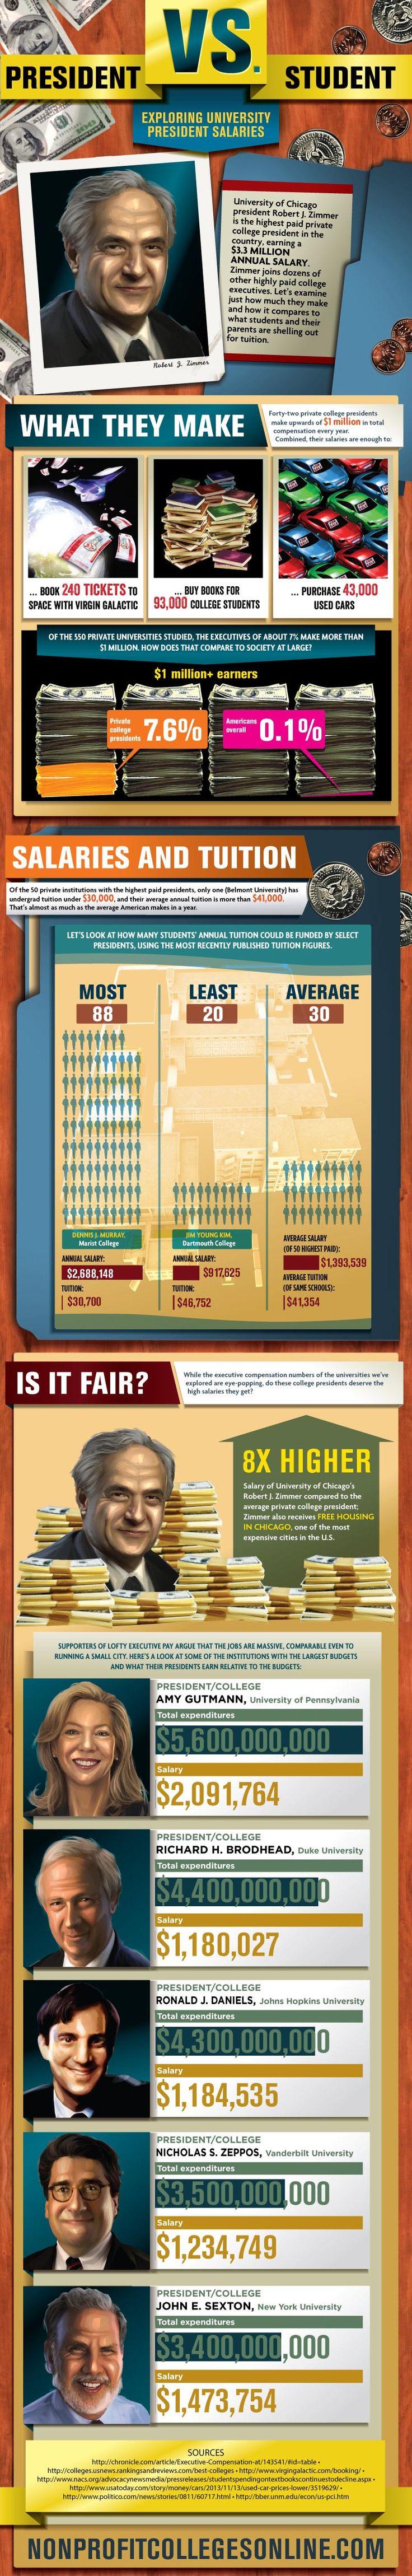 President Vs. Student: Exploring University President Salaries [Infographic]